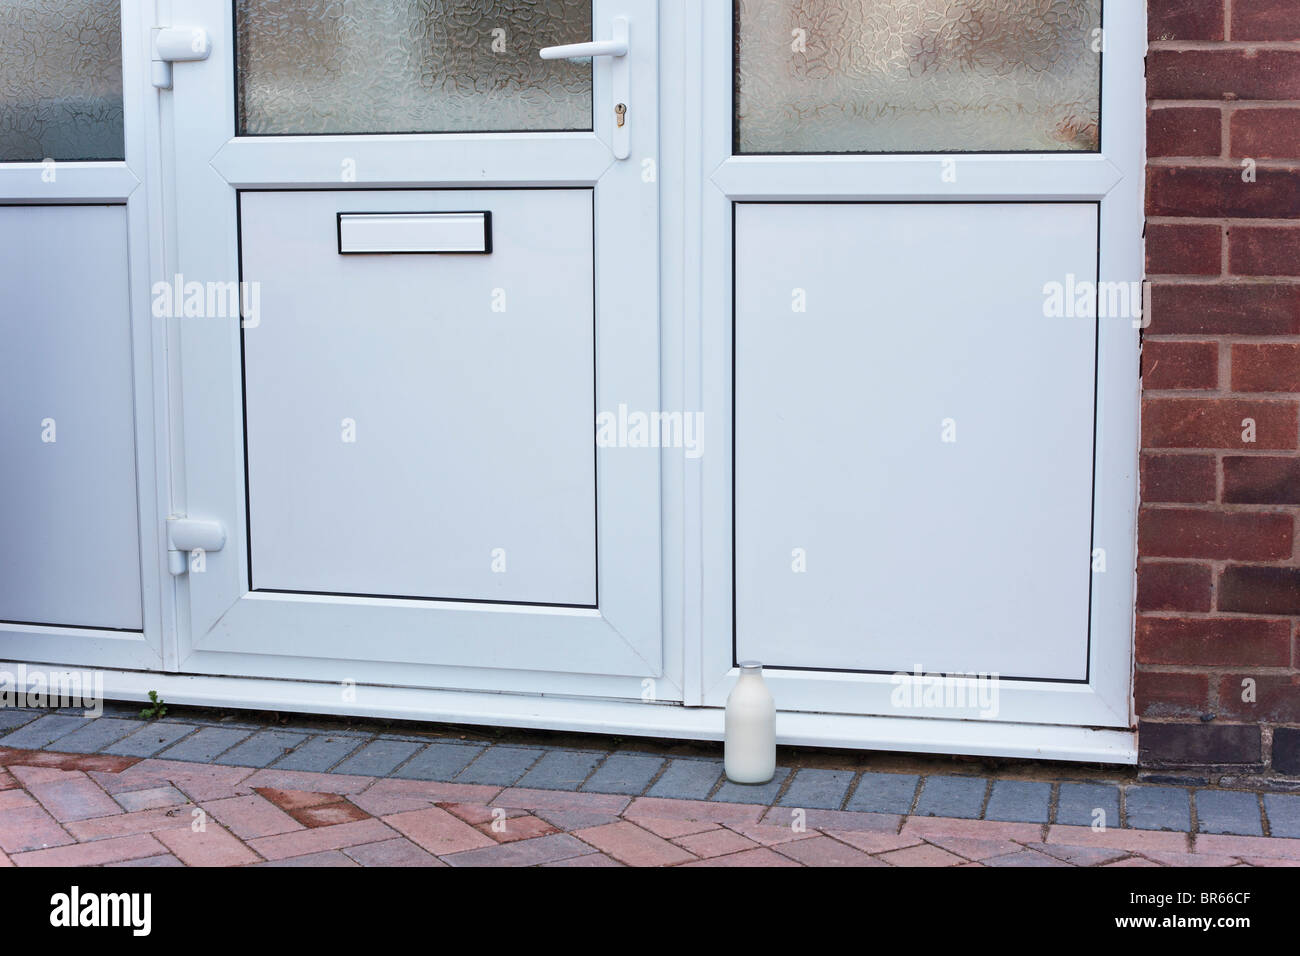 Pint of milk on the doorstep, UK - Stock Image